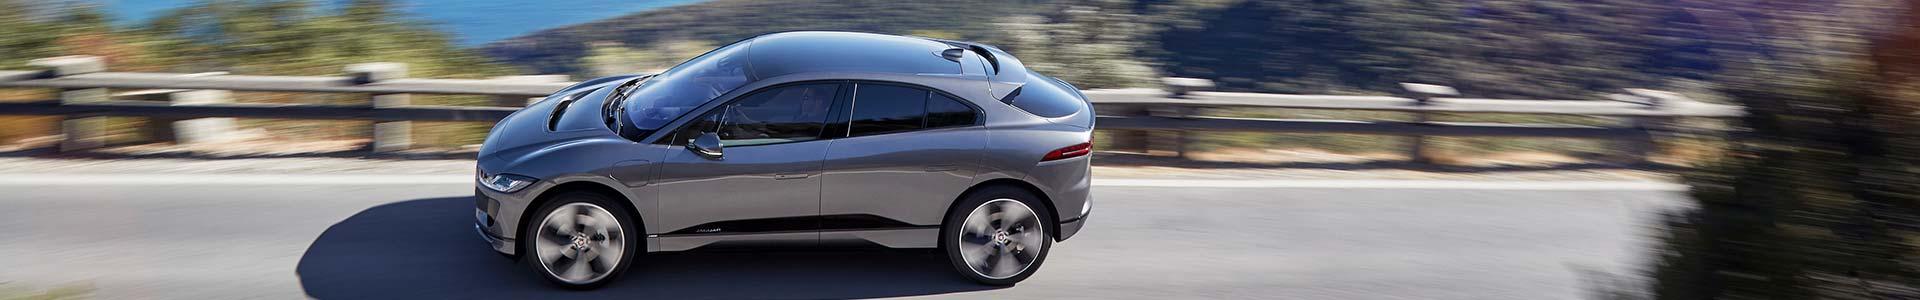 Der neue Jaguar I-PACE